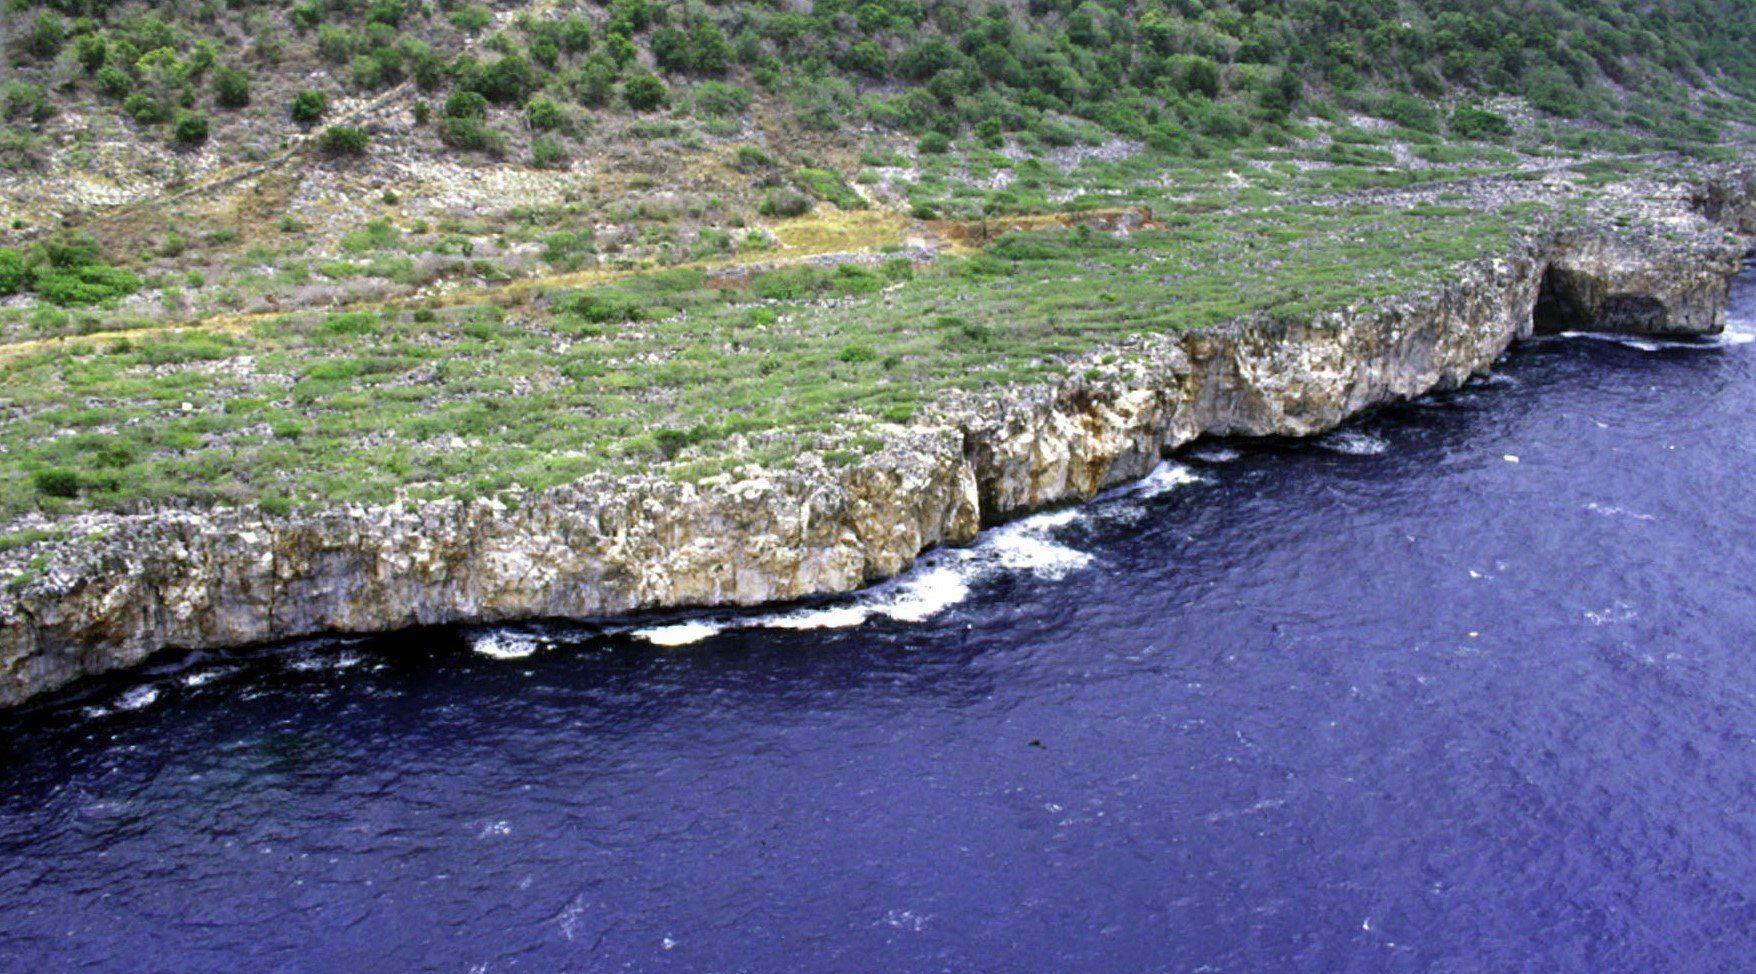 Coast of Navassa Island, photo by U.S. Geological Survey